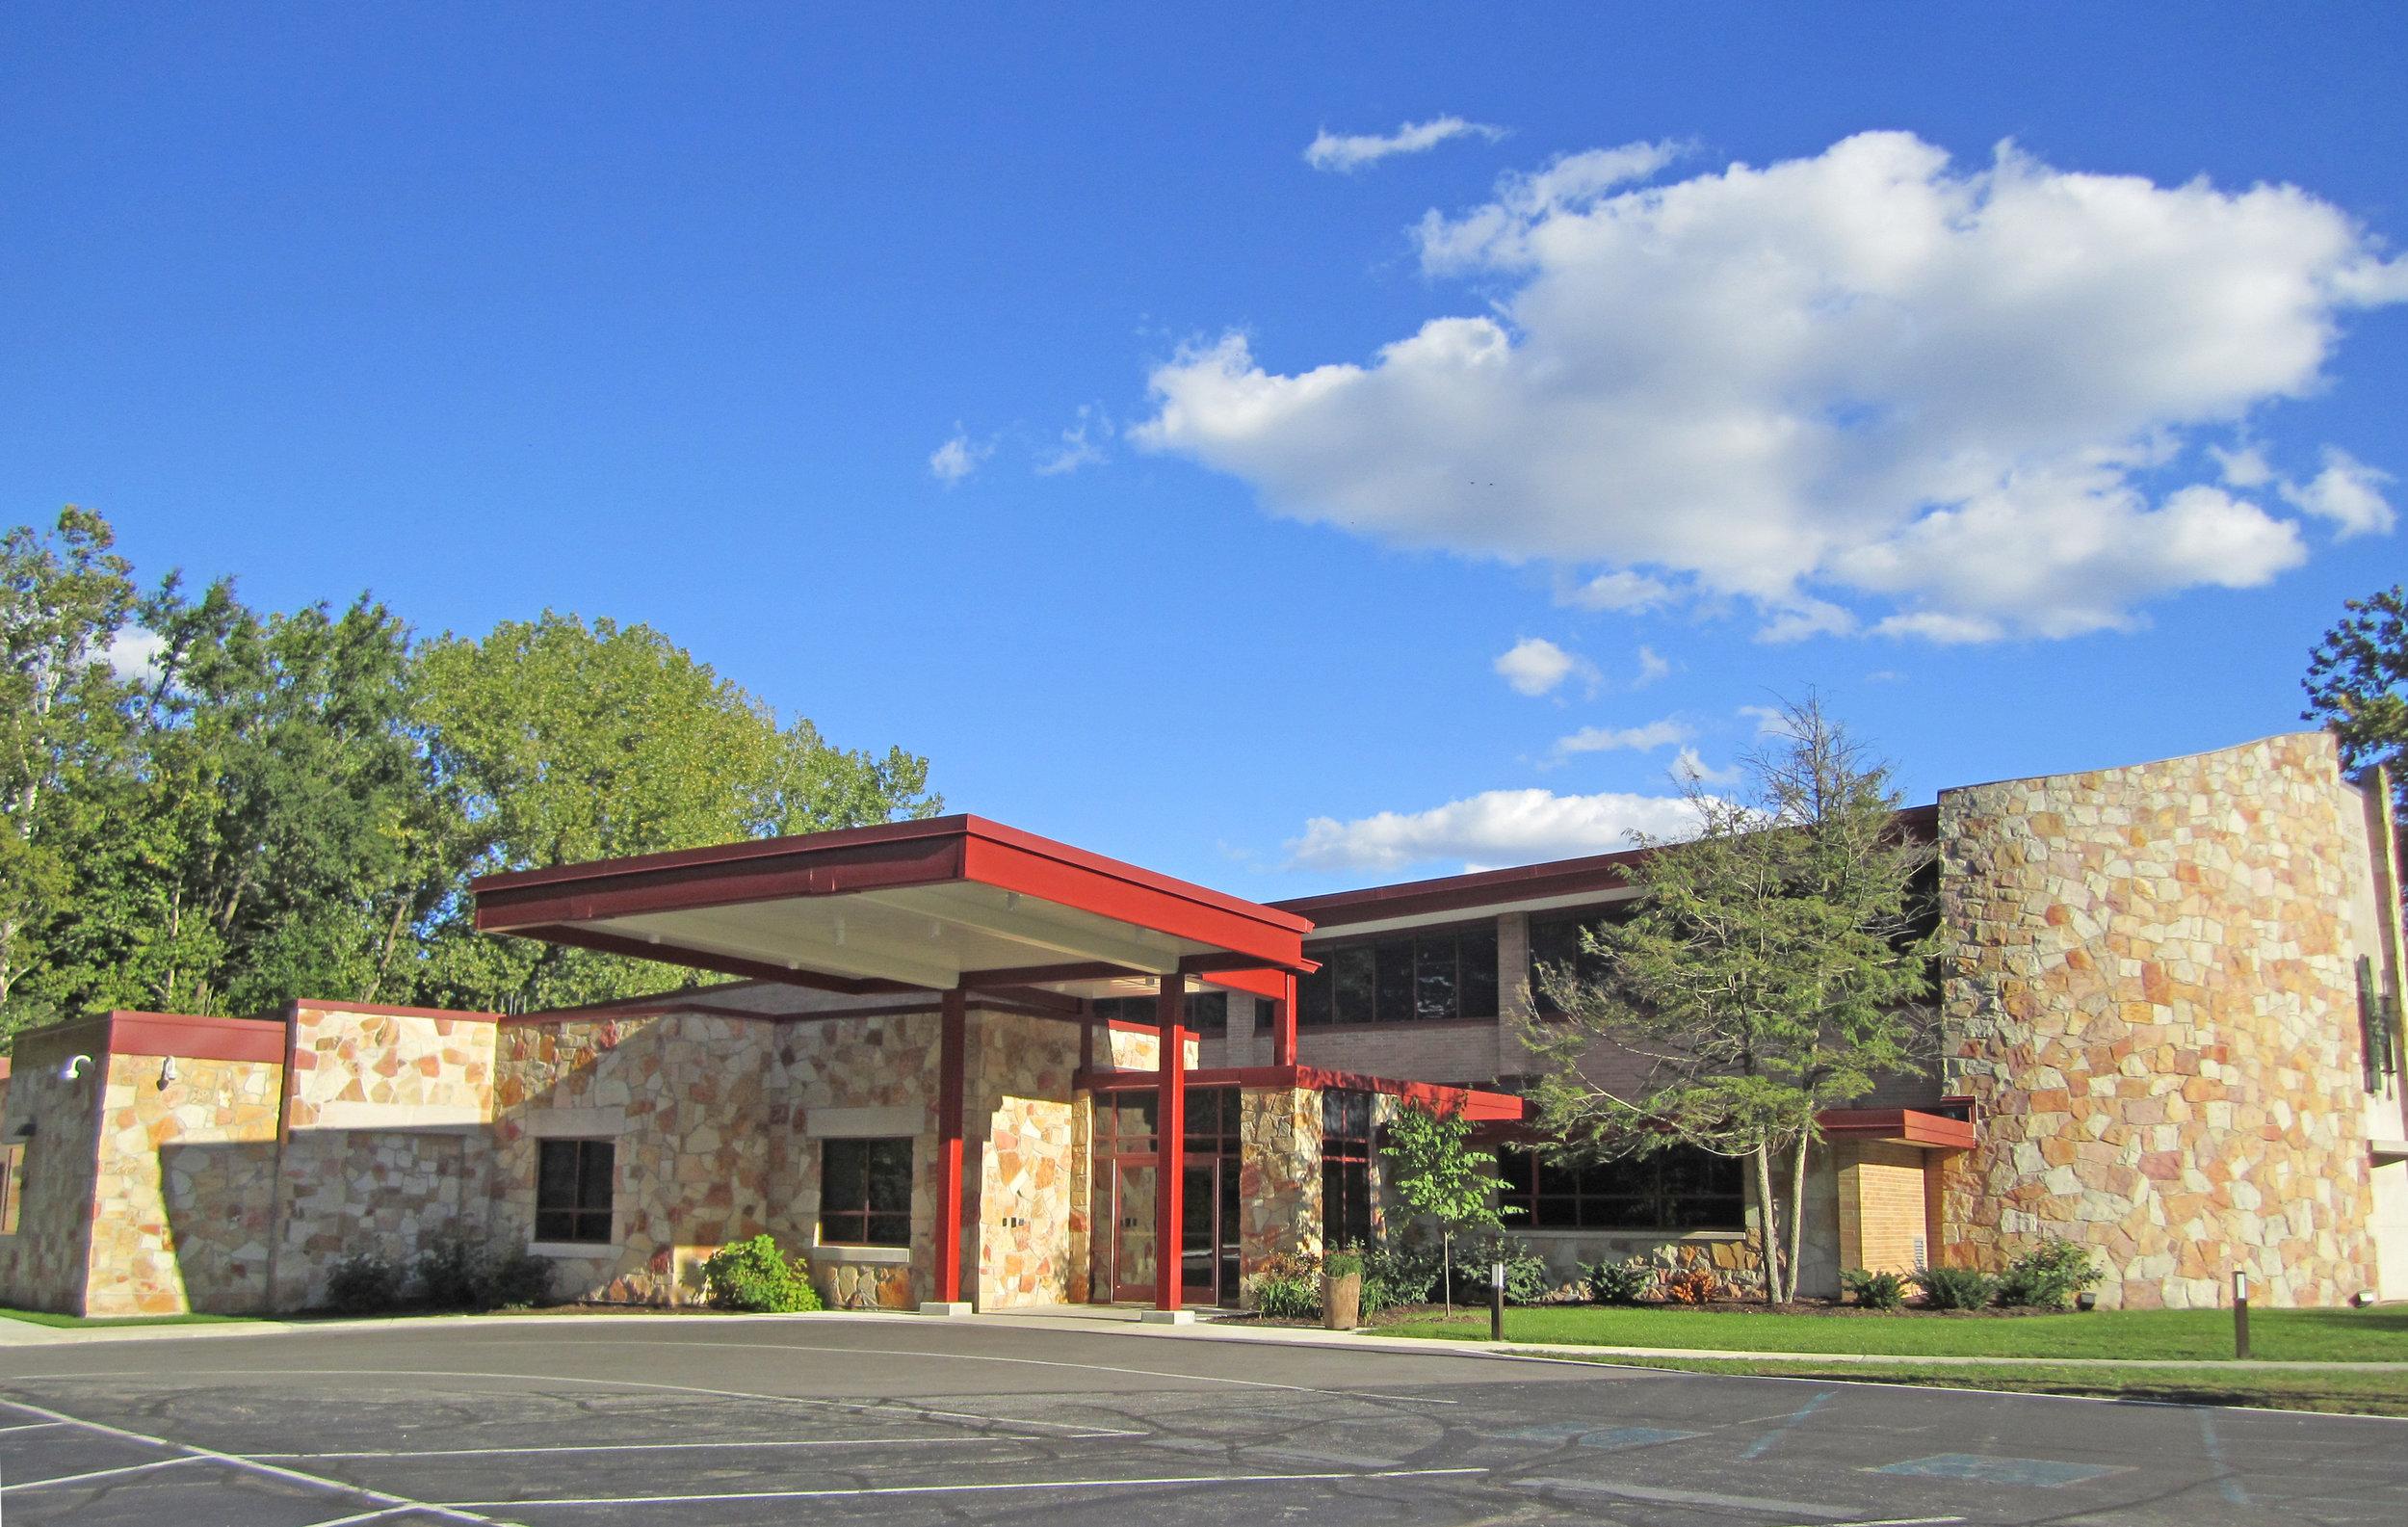 Indianapolis Hebrew congregation renovation/expansion